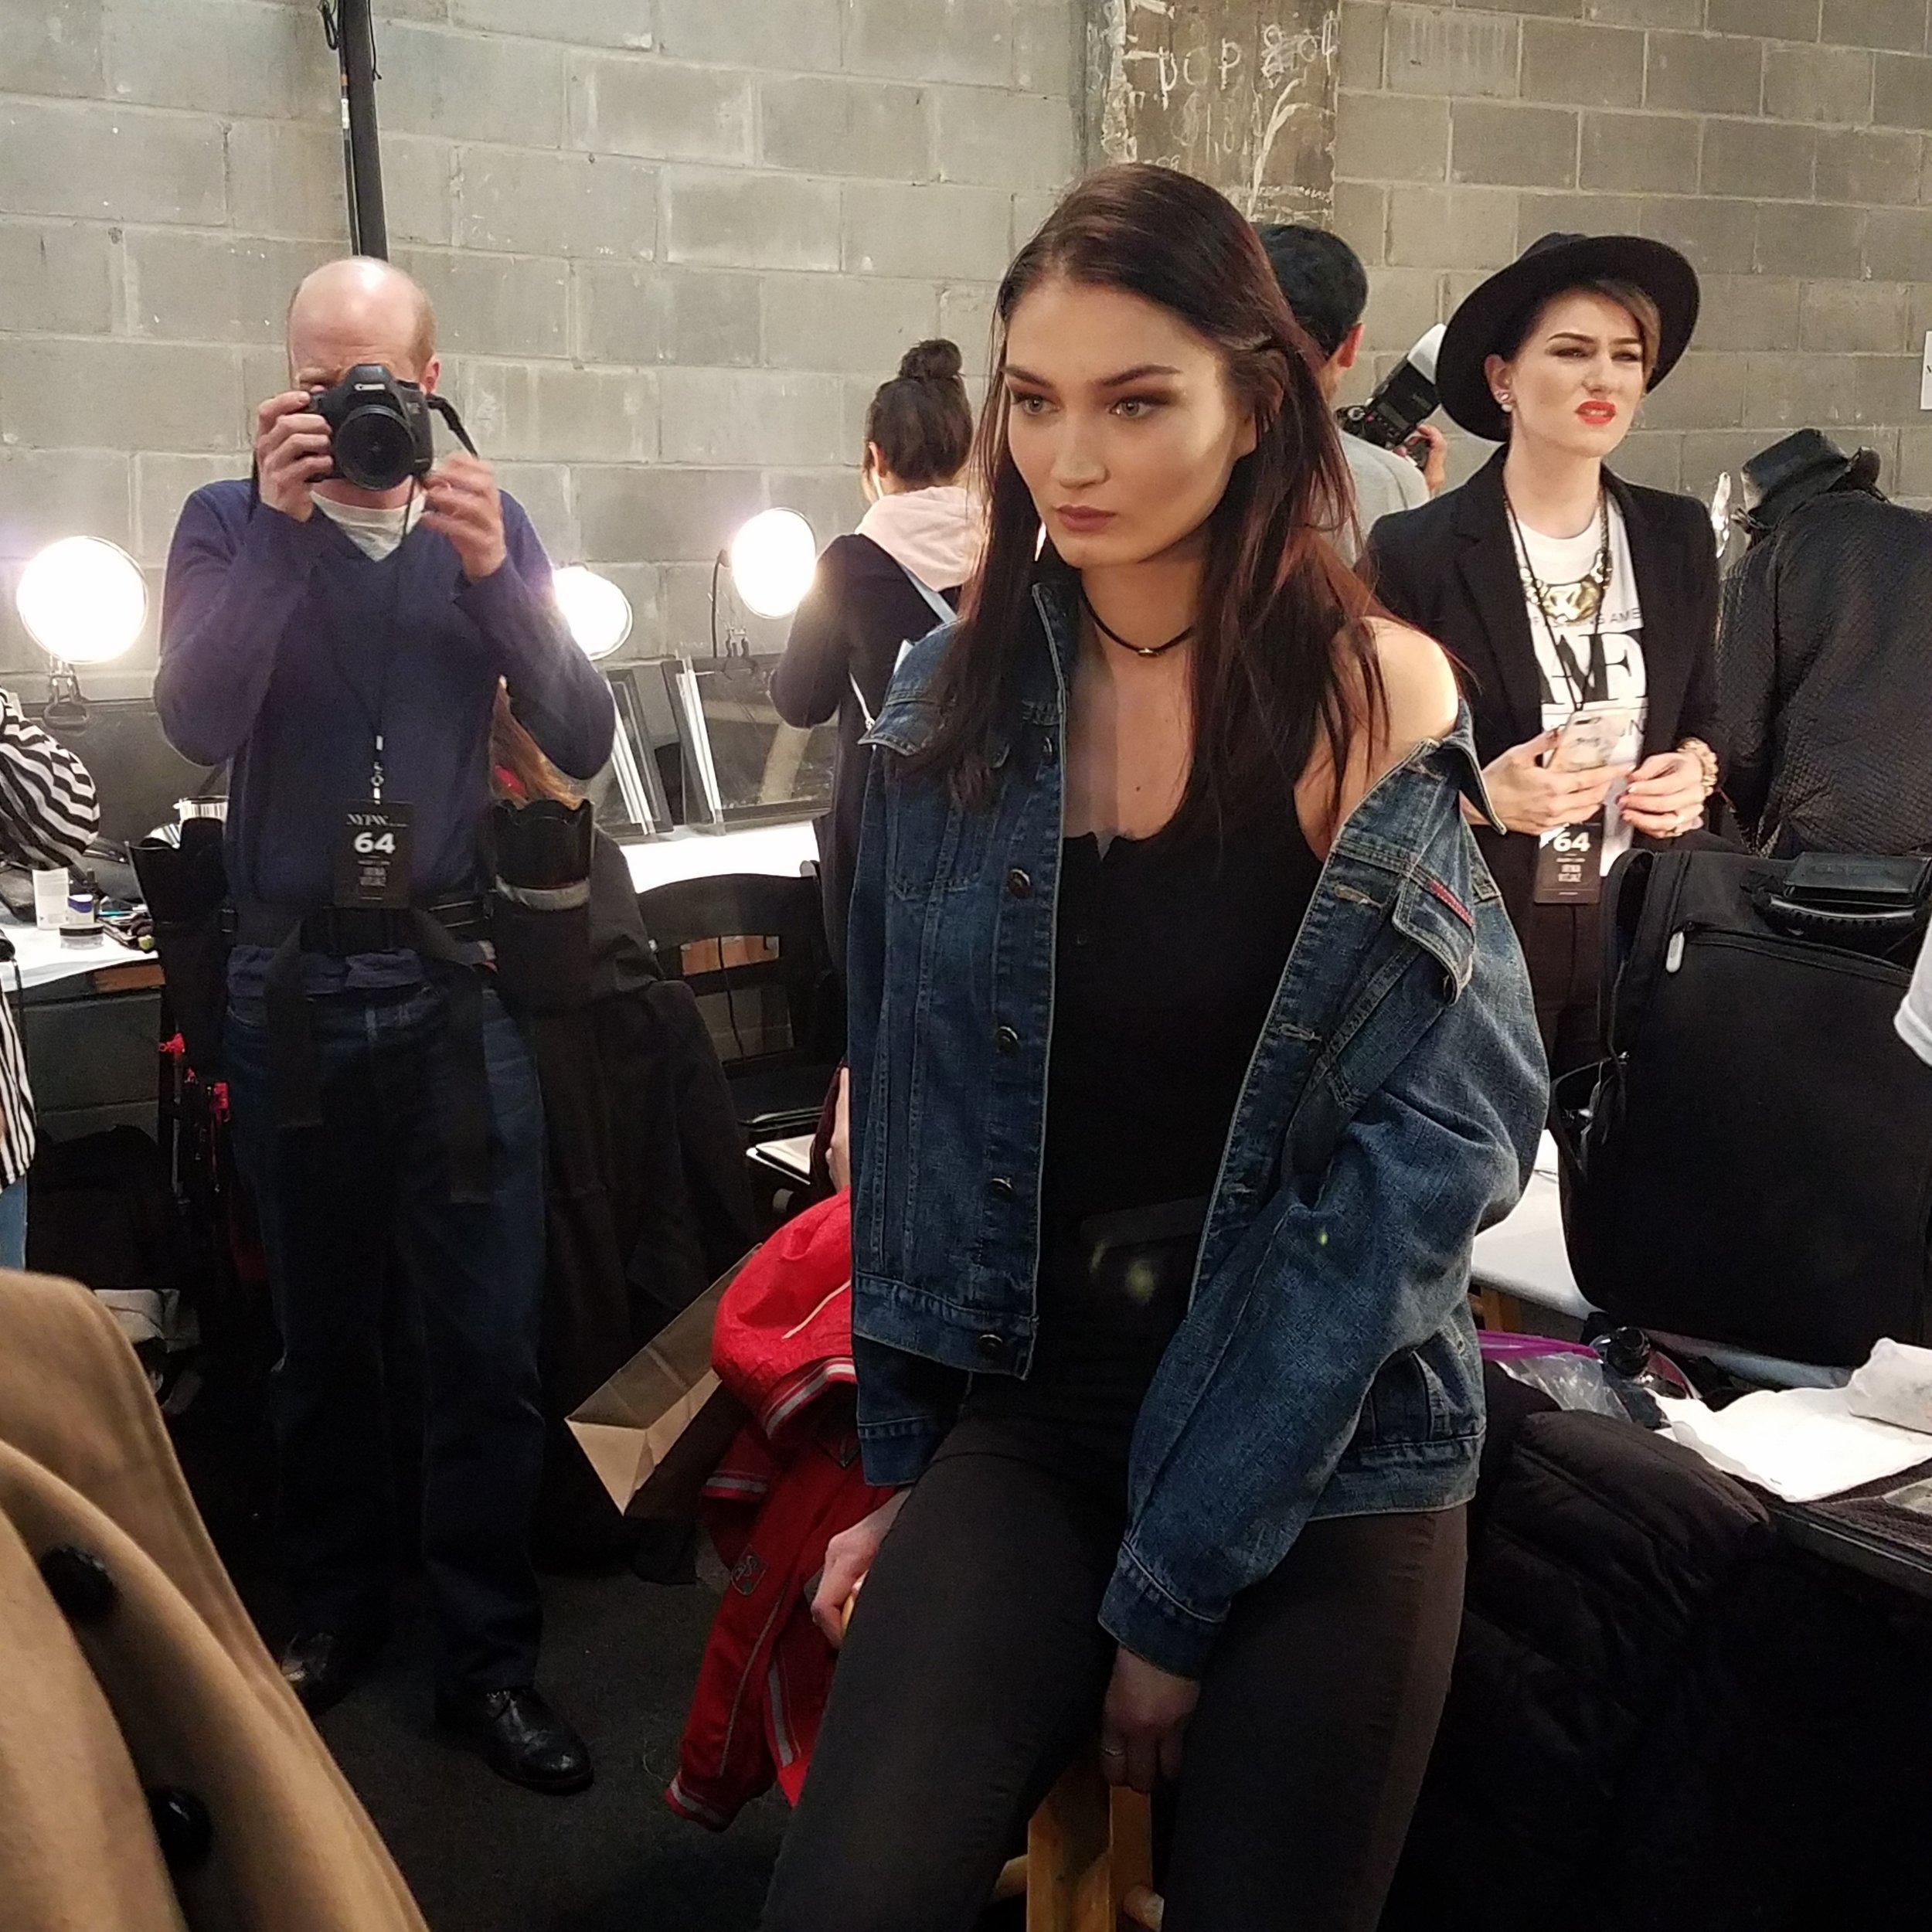 Backstage New York Fashion Week Beauty Secrets